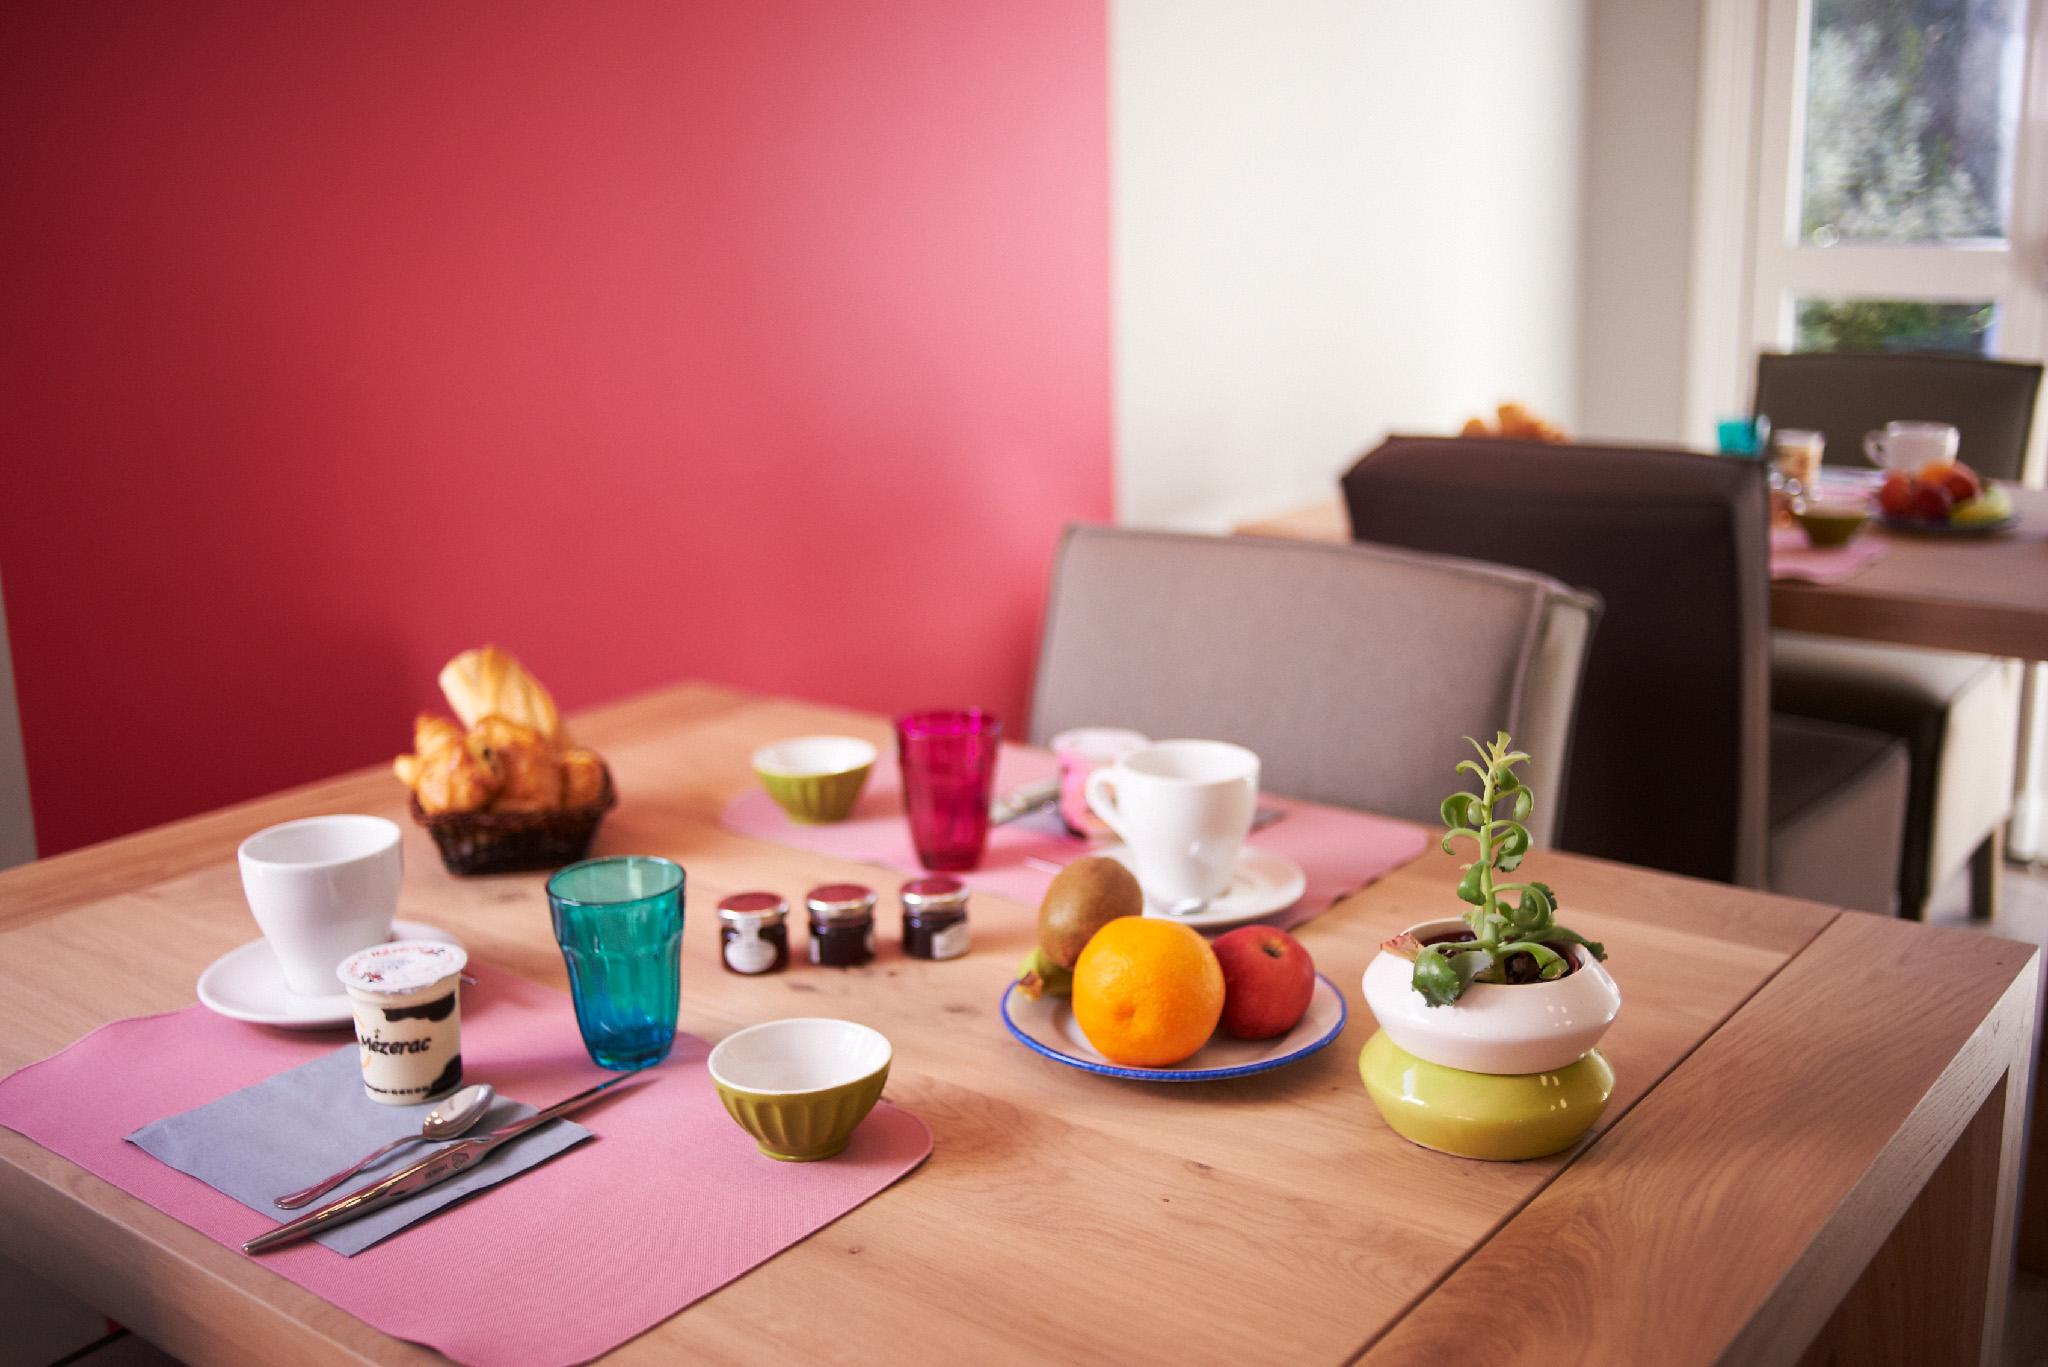 52_photographie_hotel_restaurant_nantes